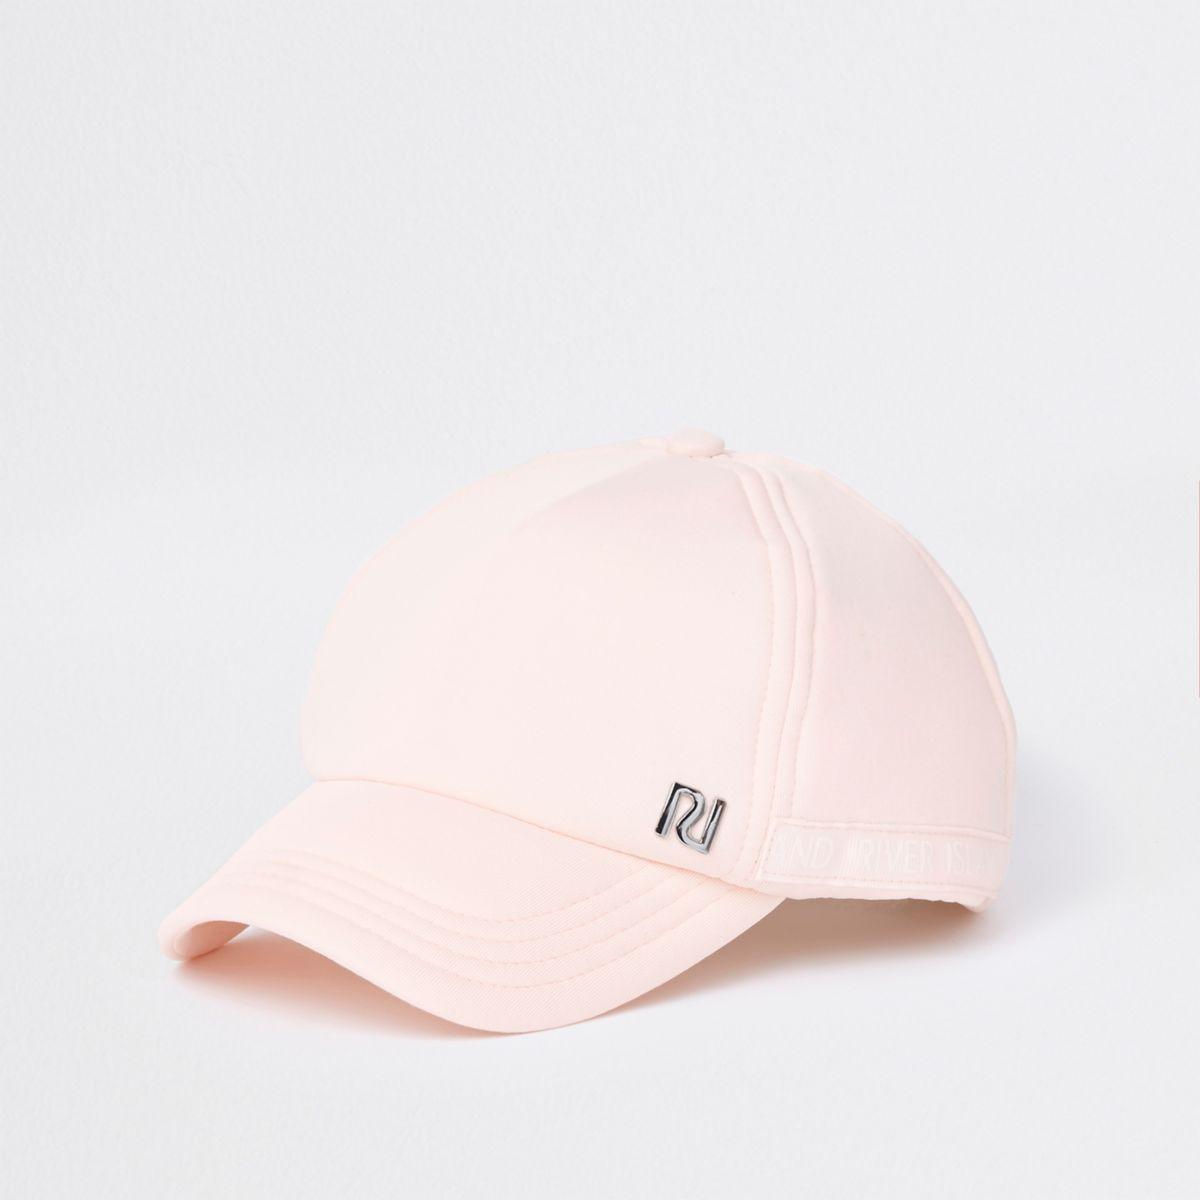 RI – Casquette de baseball rose pour fille